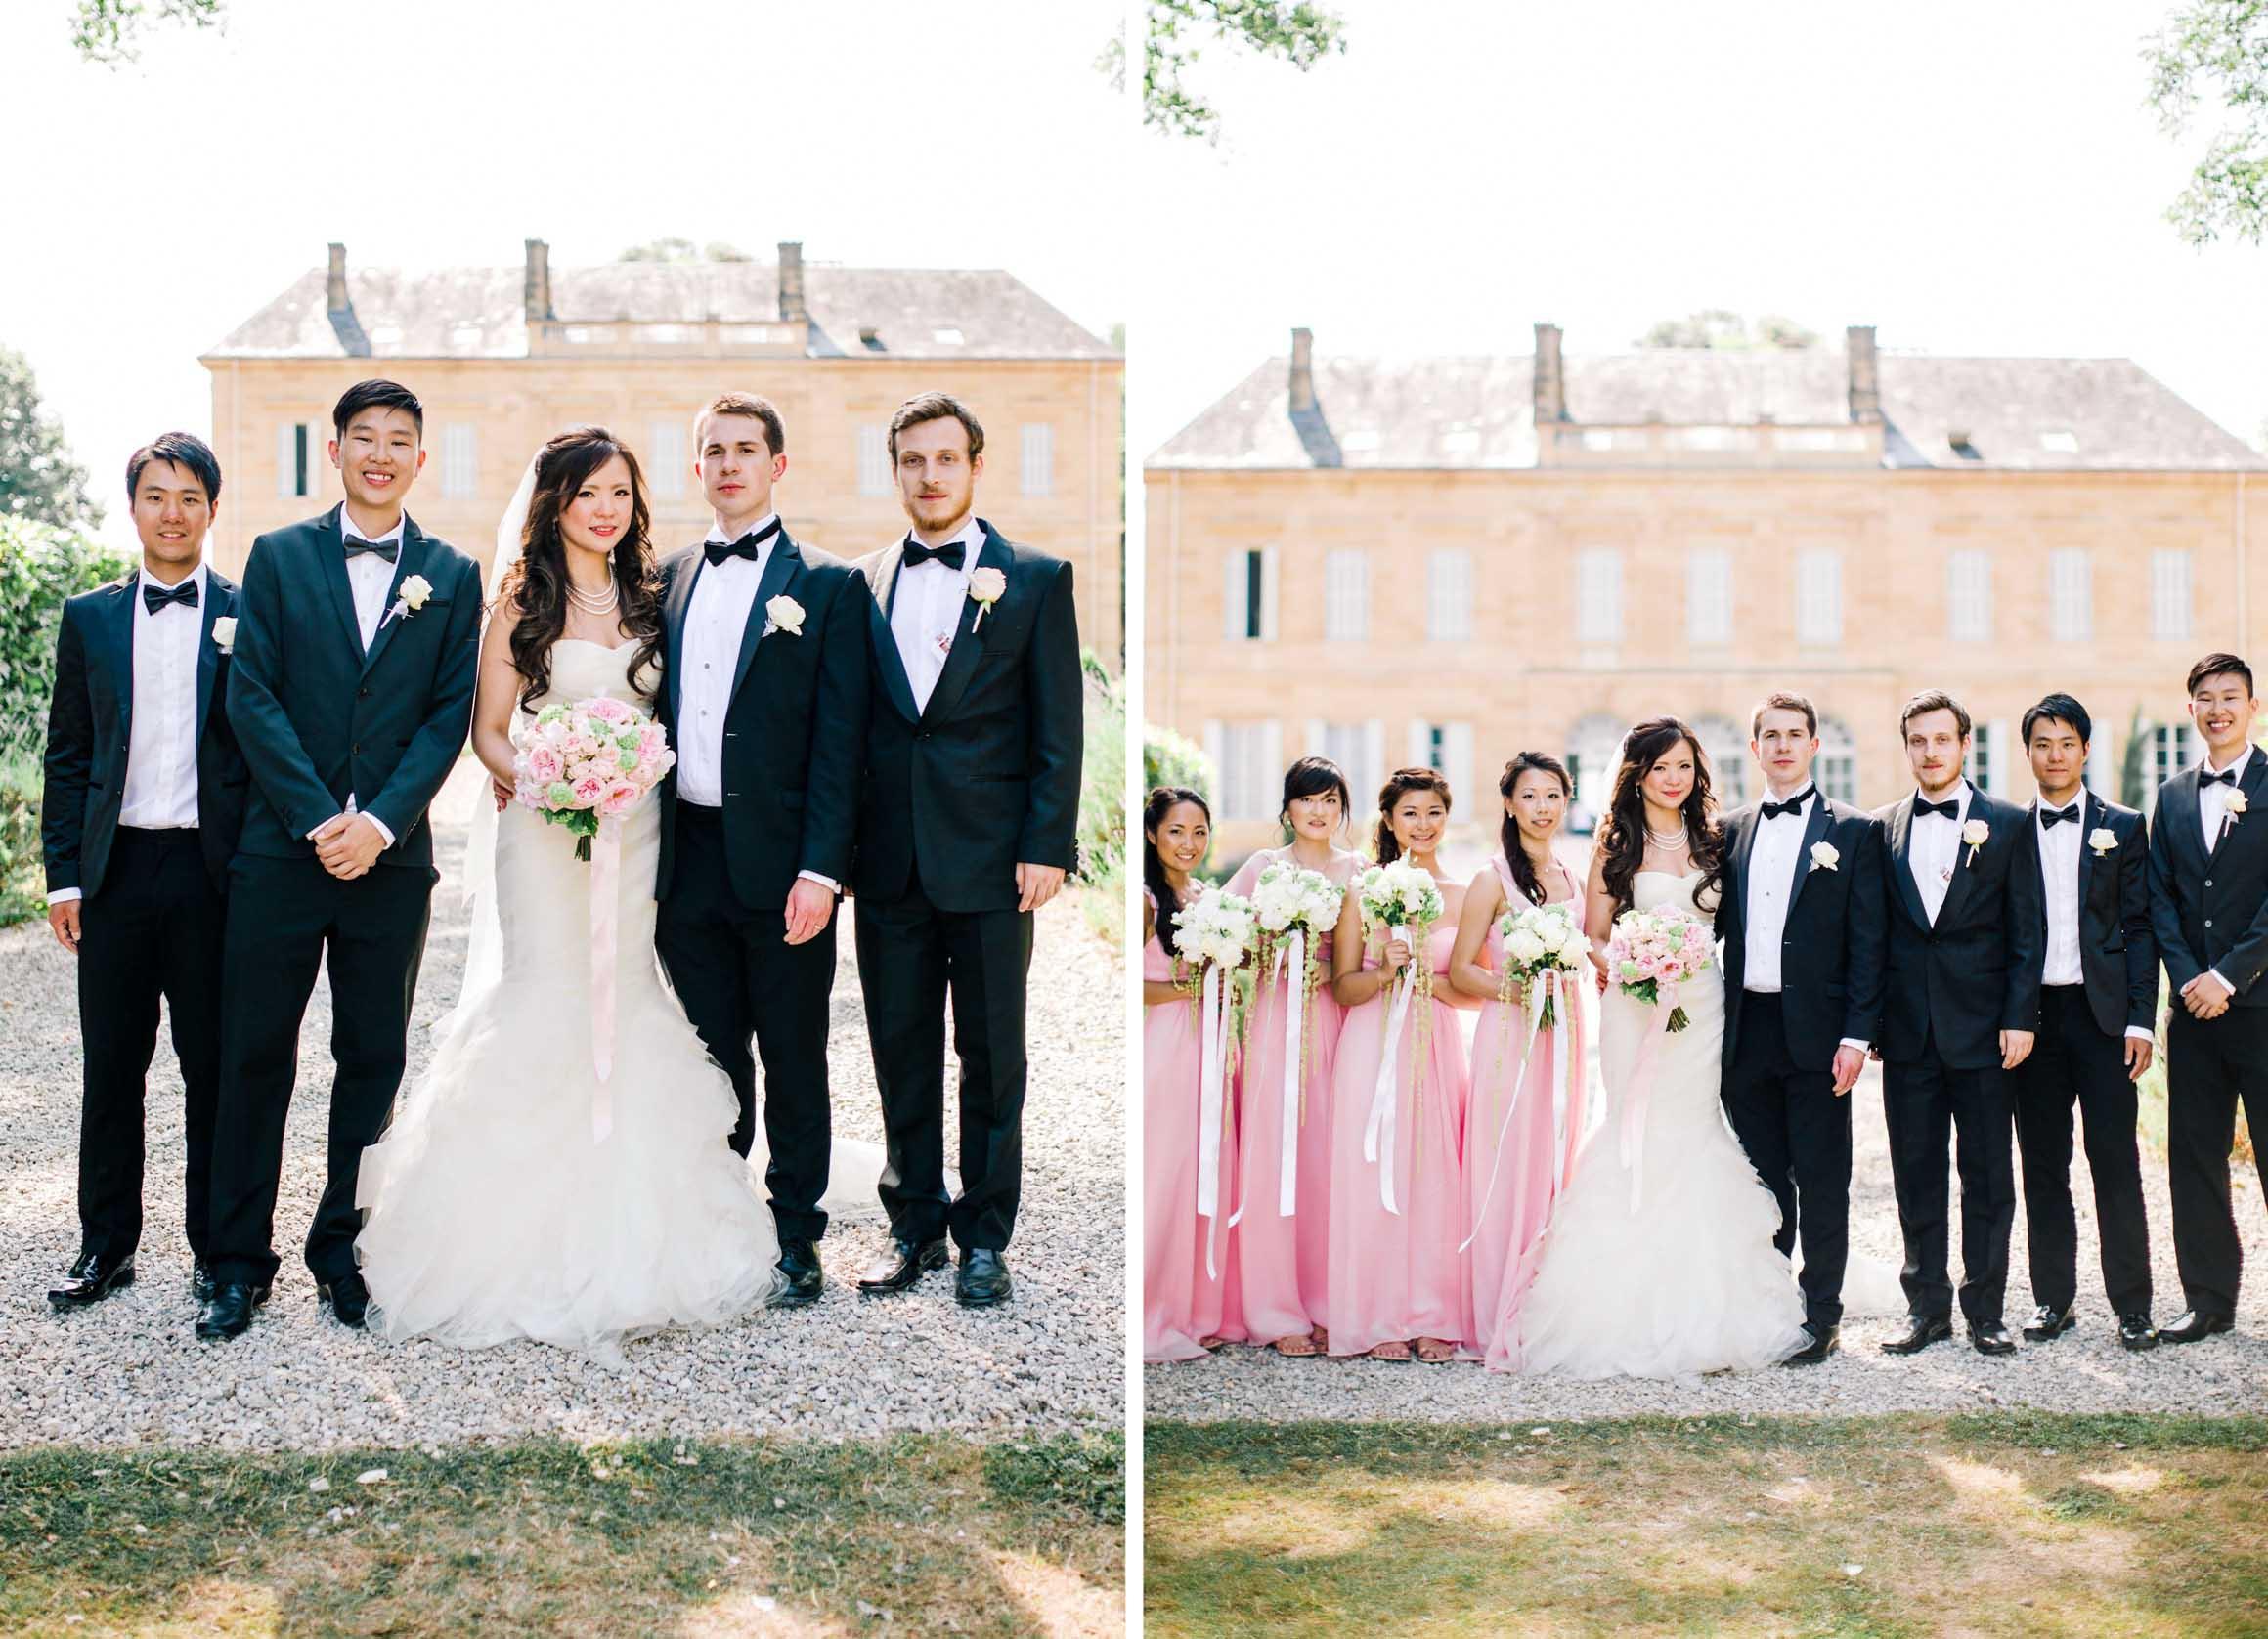 Amy O'Boyle Photography- Destination & UK Fine Art Film Wedding Photographer- Chateau La Durantie Wedding 8.jpg